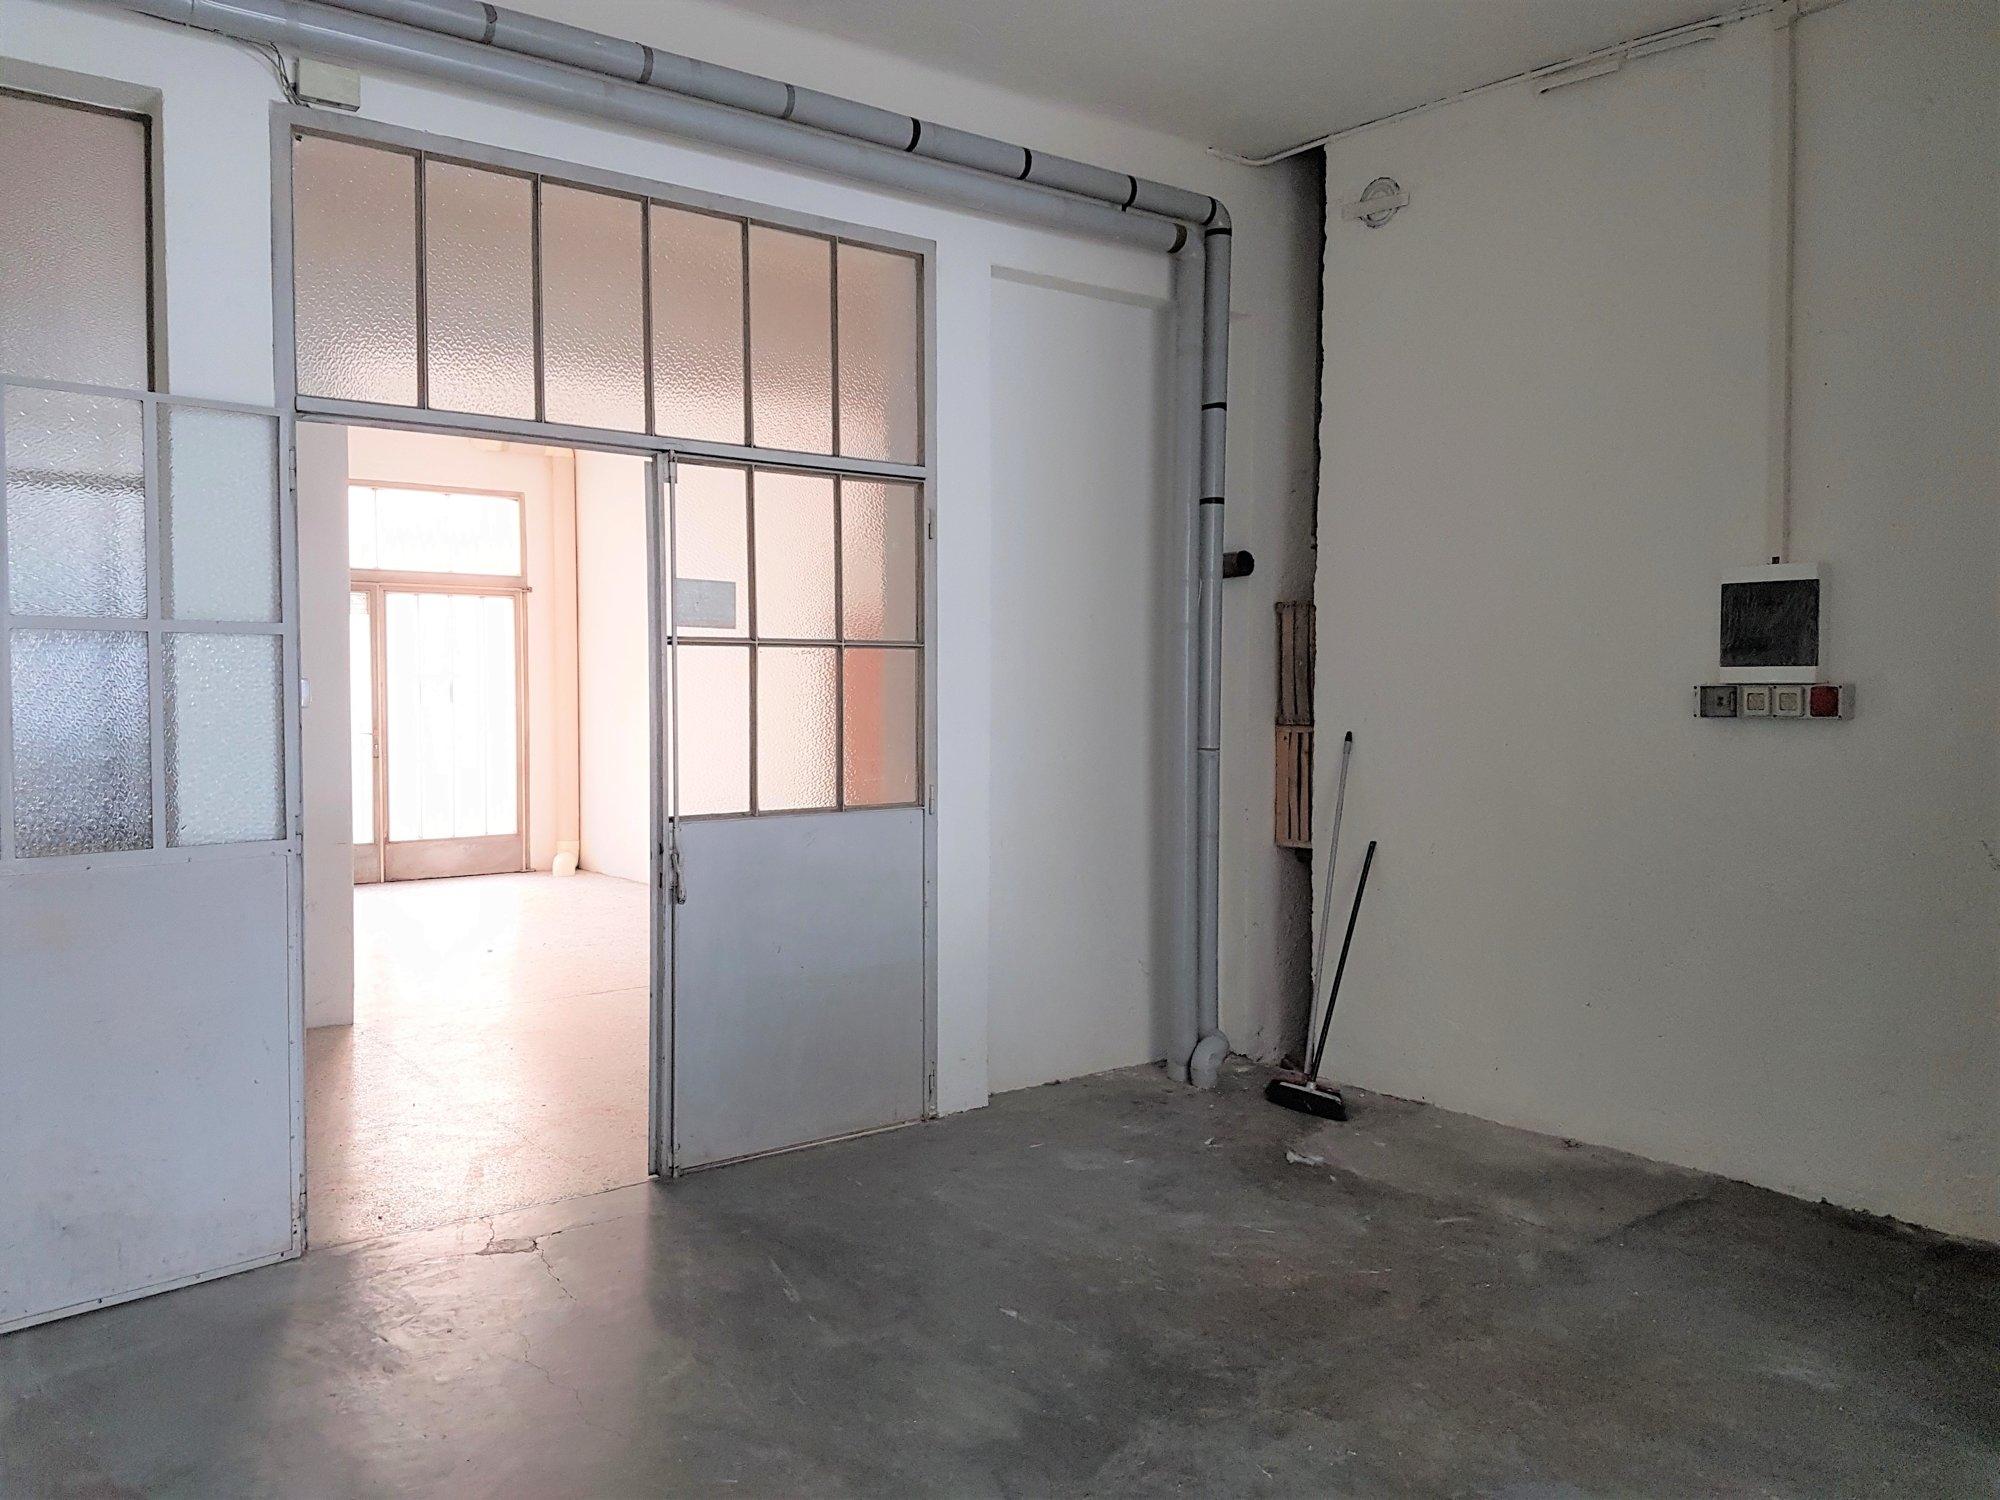 Breite Eingangstür_porta d'entrata larga